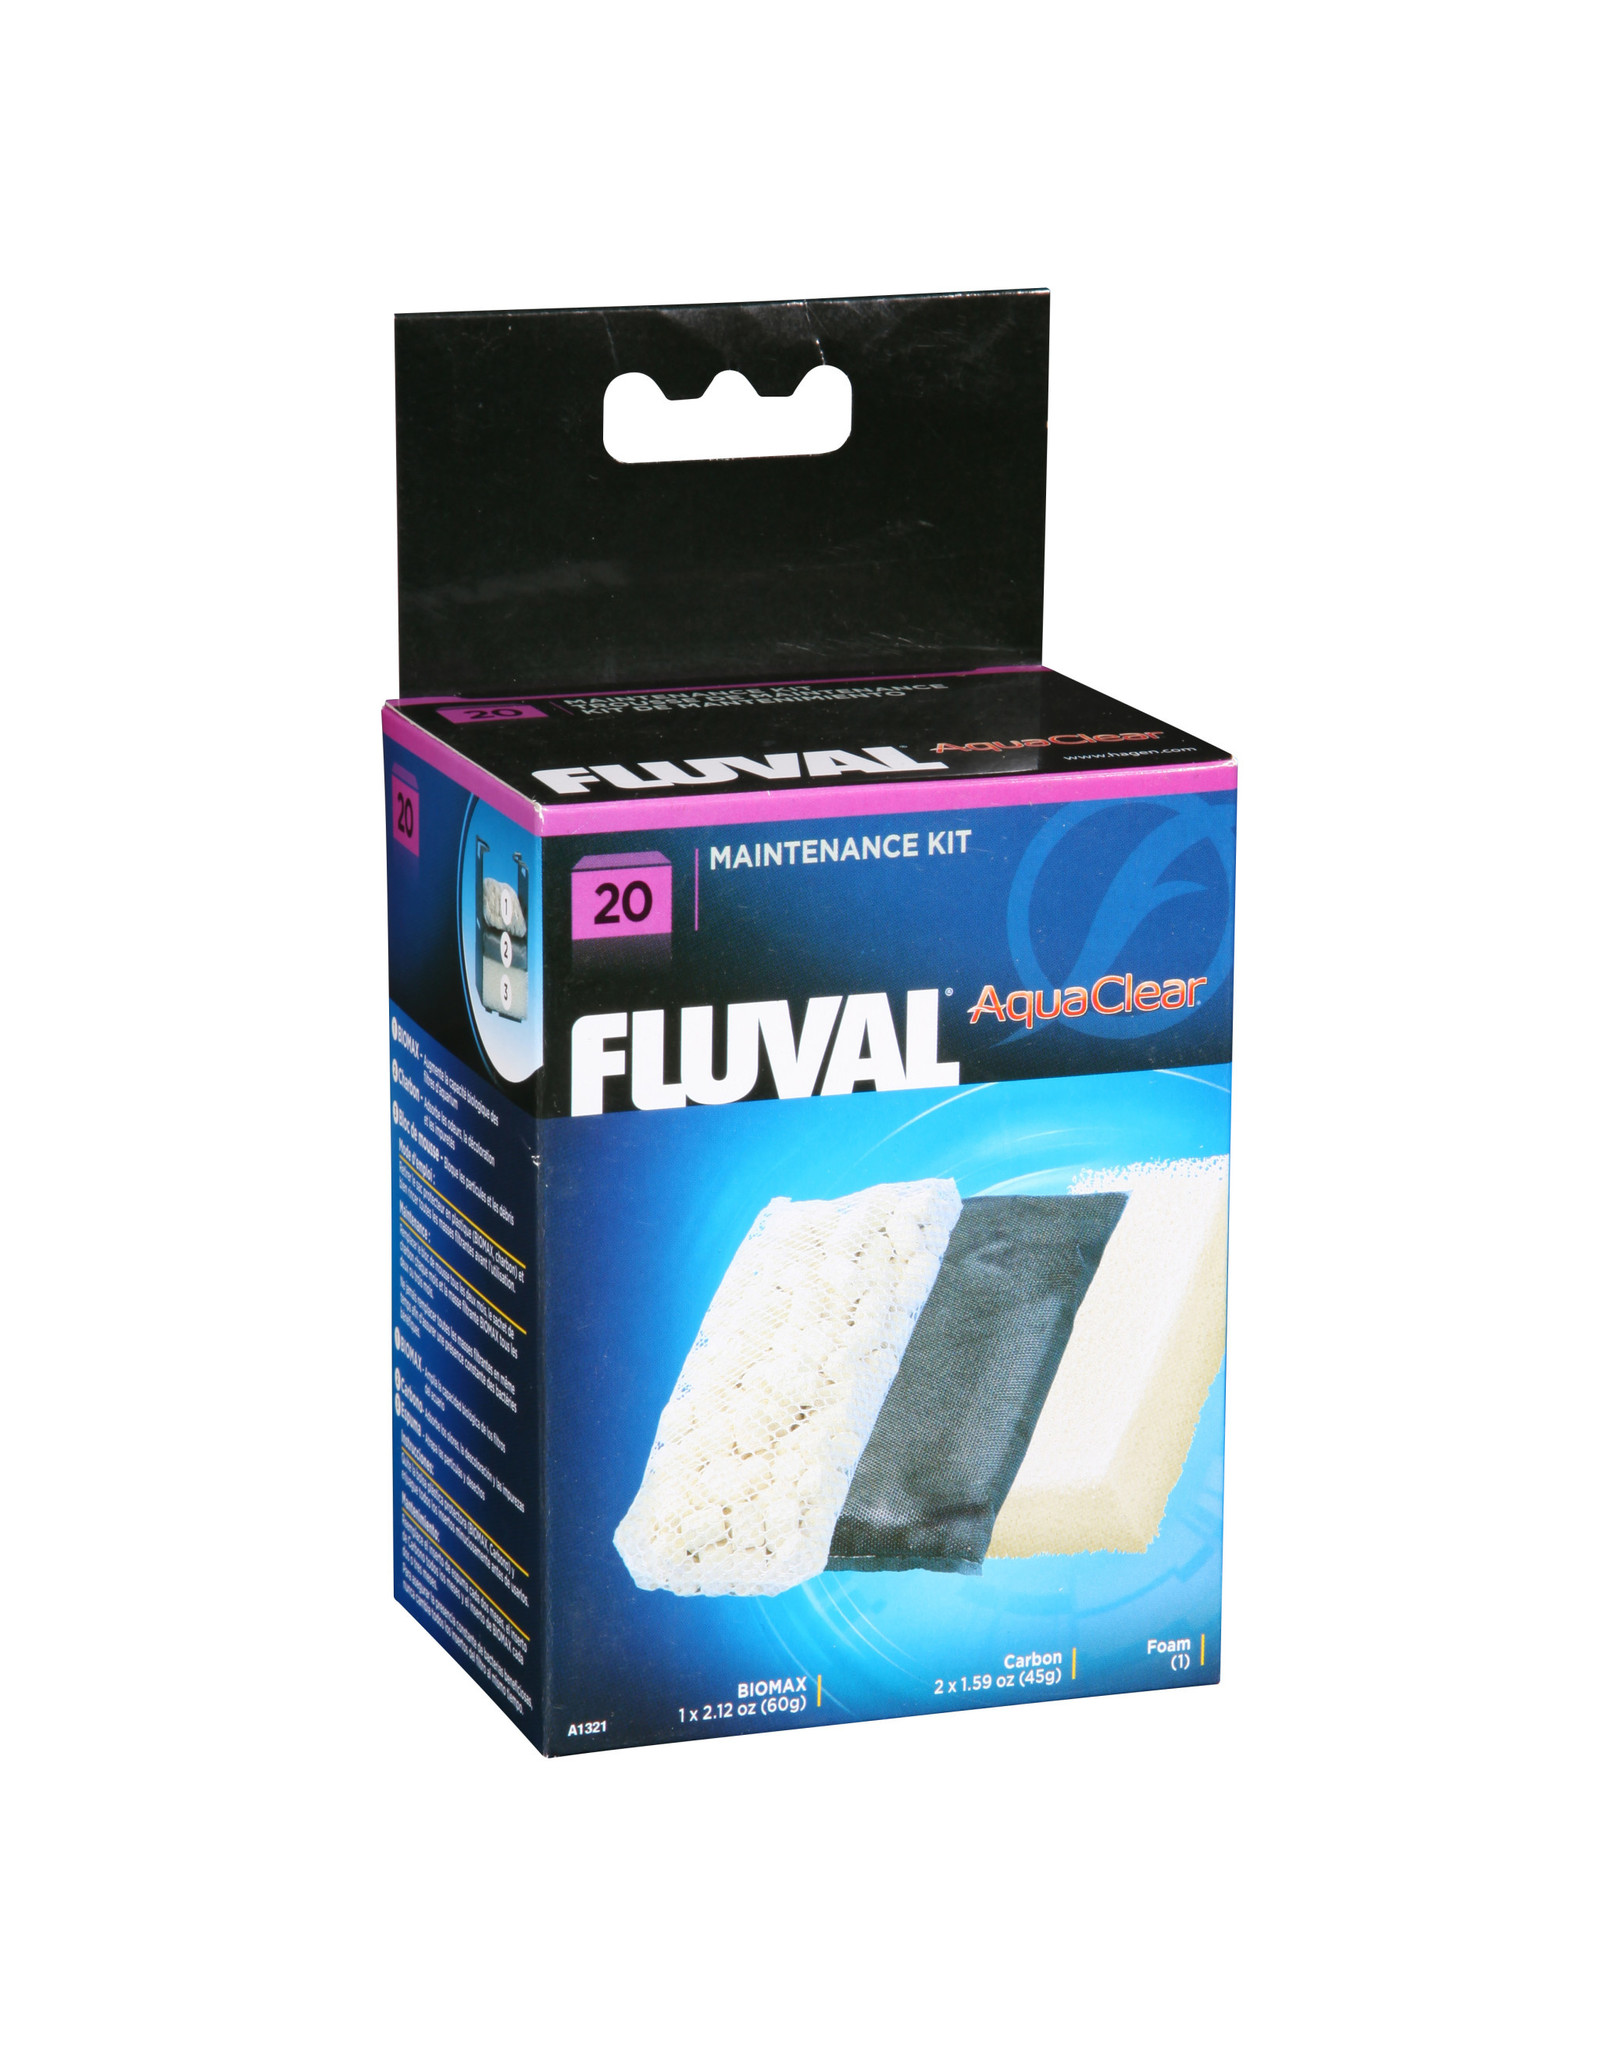 Fluval Fuval /Aquaclear 20 Filter Media Maintenance Kit